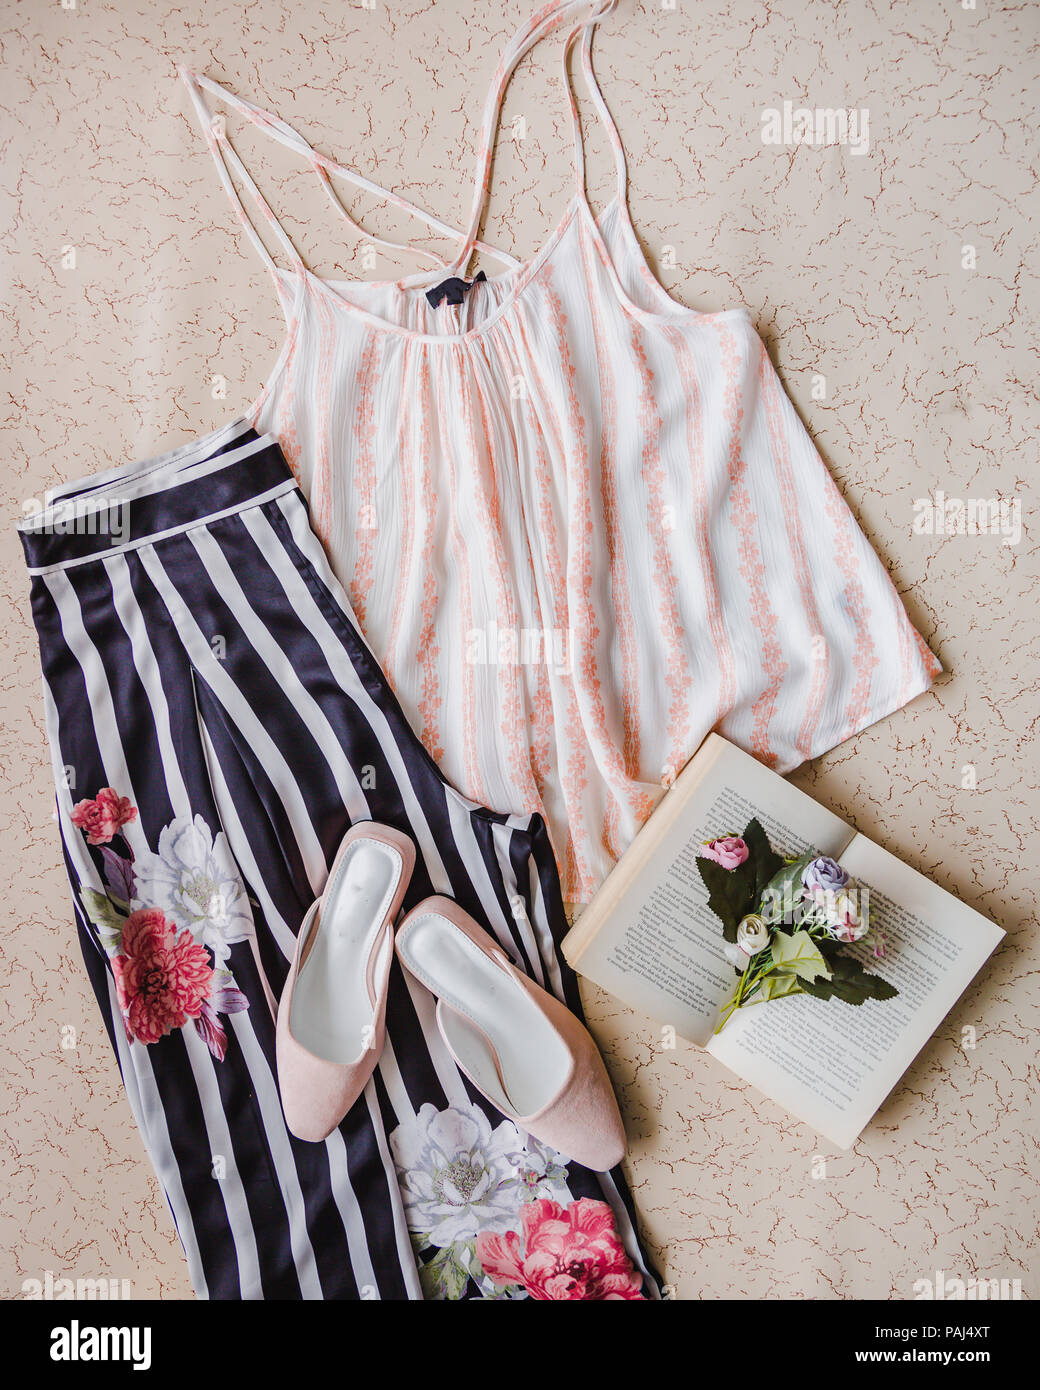 7d99feda5 Conjunto de ropa de moda